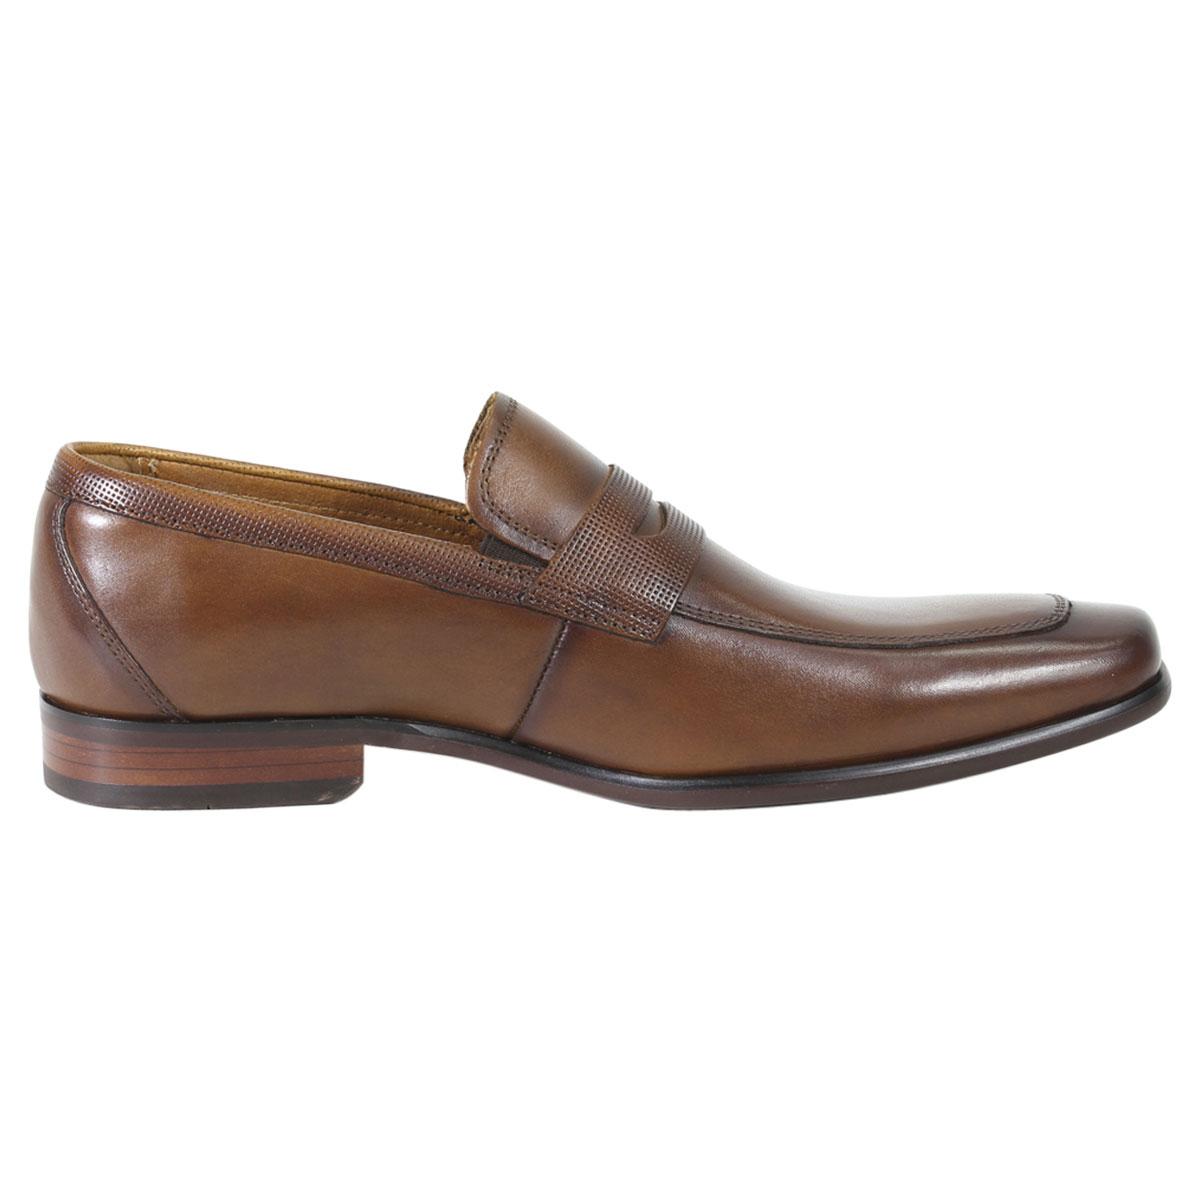 Florsheim-Men-039-s-Postino-Penny-Loafers-Shoes thumbnail 19